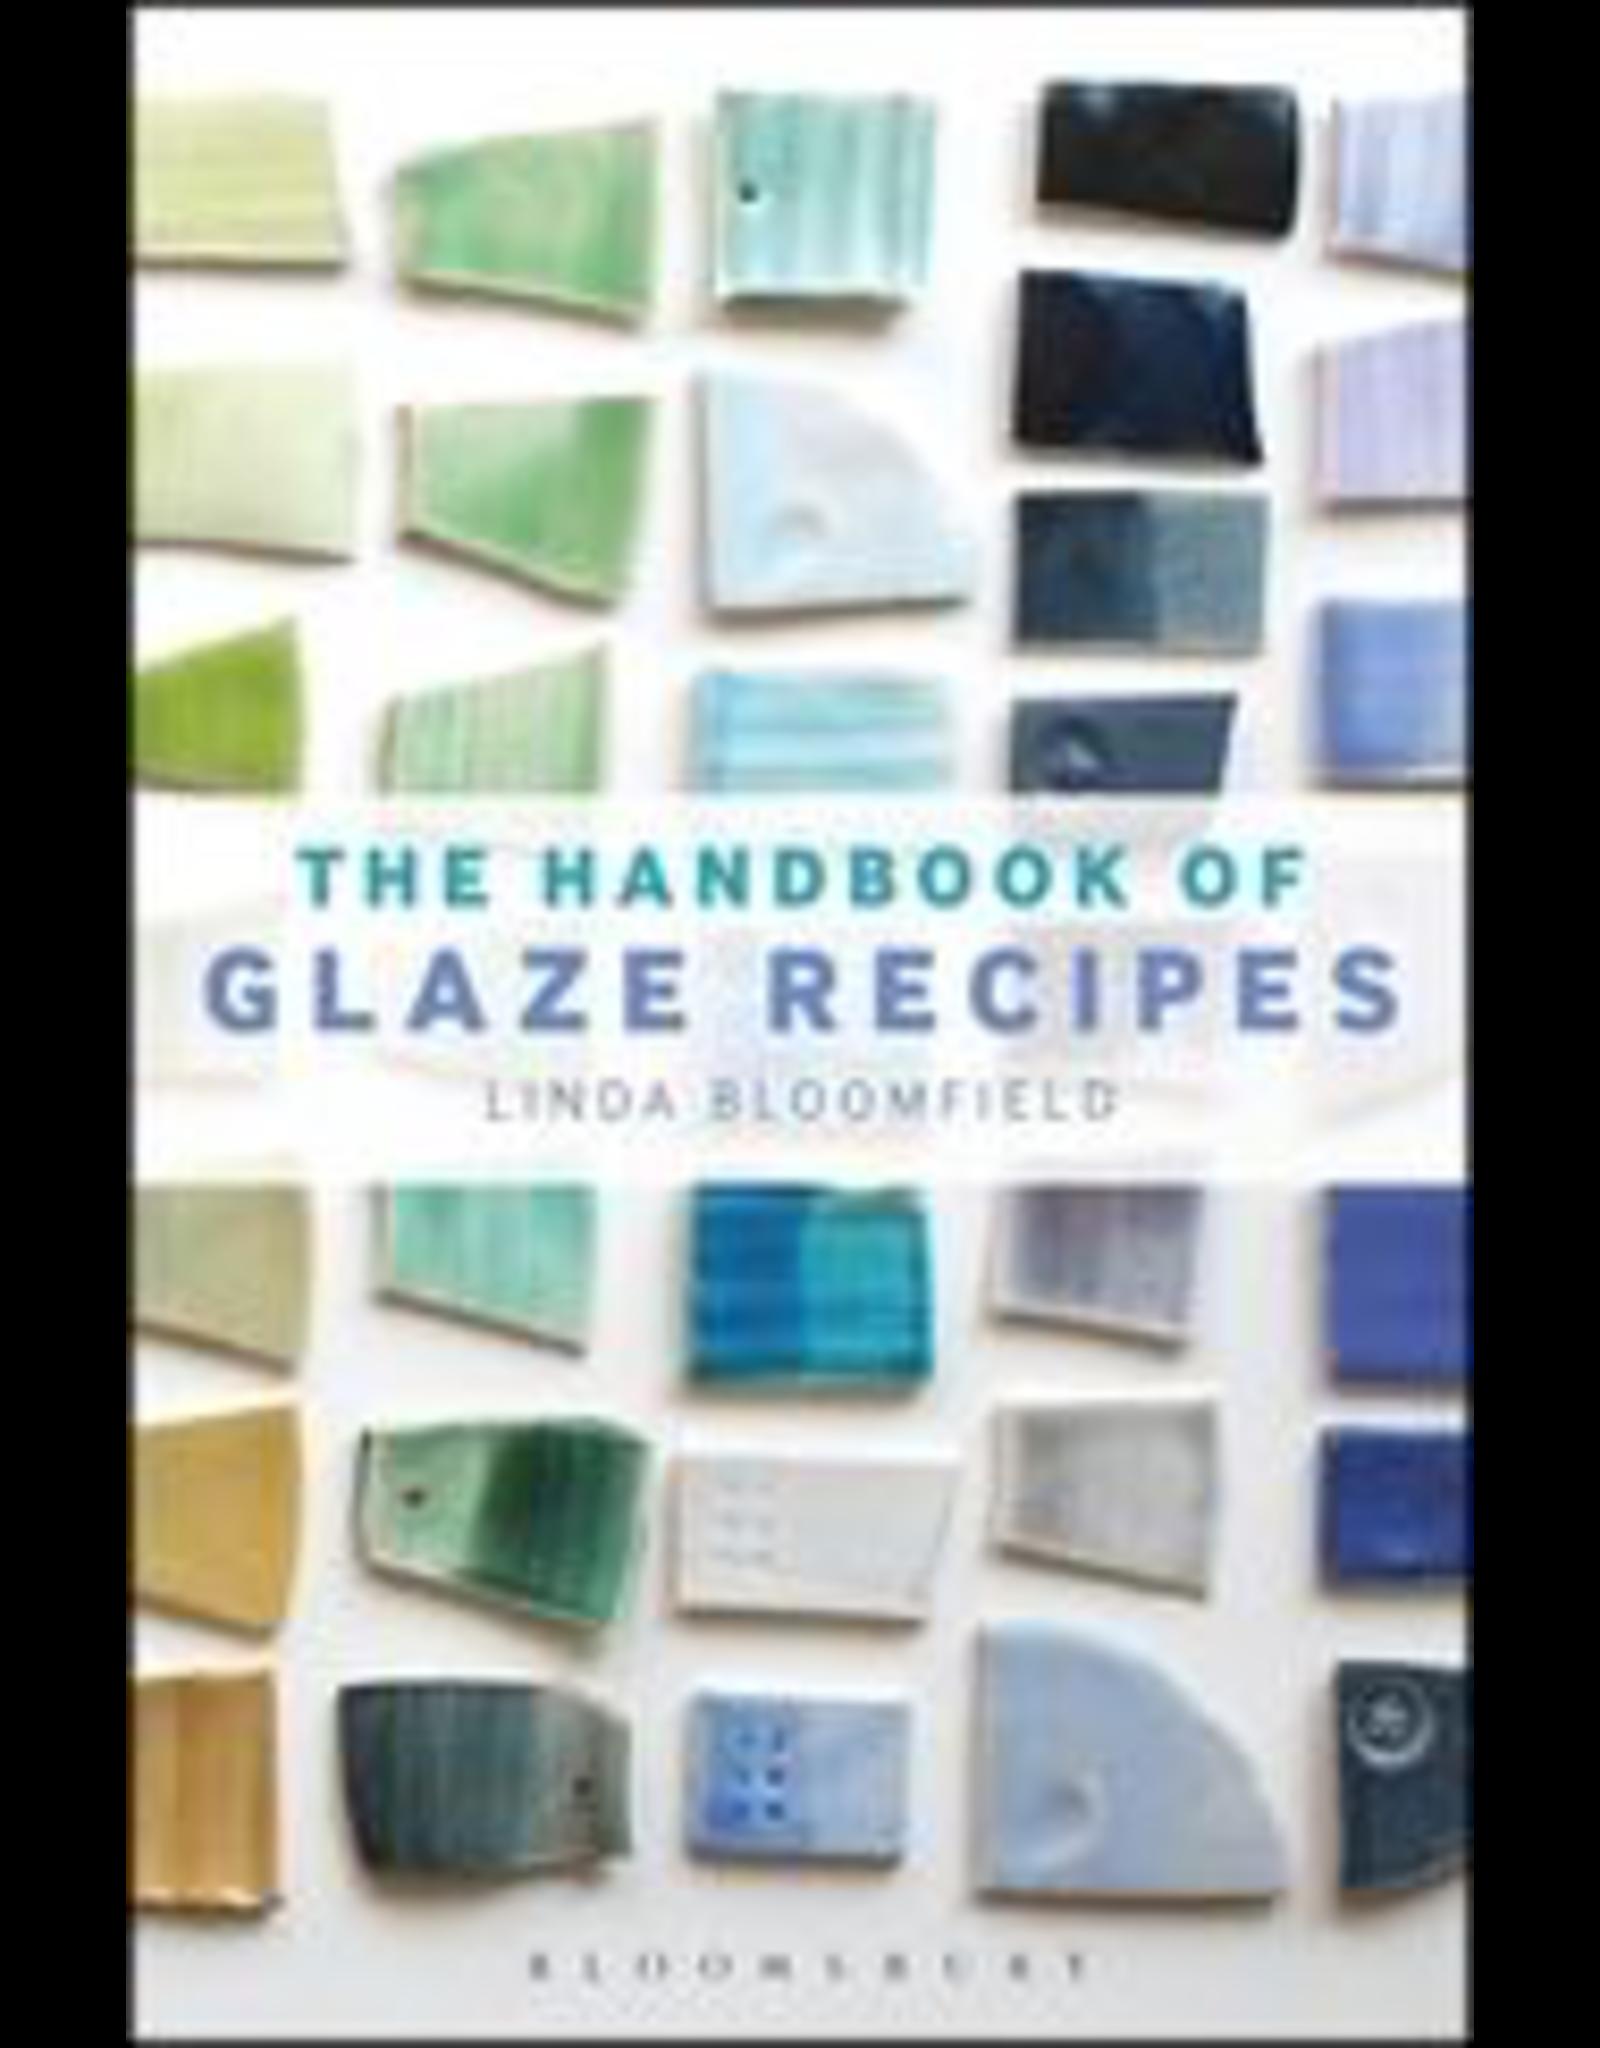 Handbook of Glaze Recipes : Linda Bloomfield